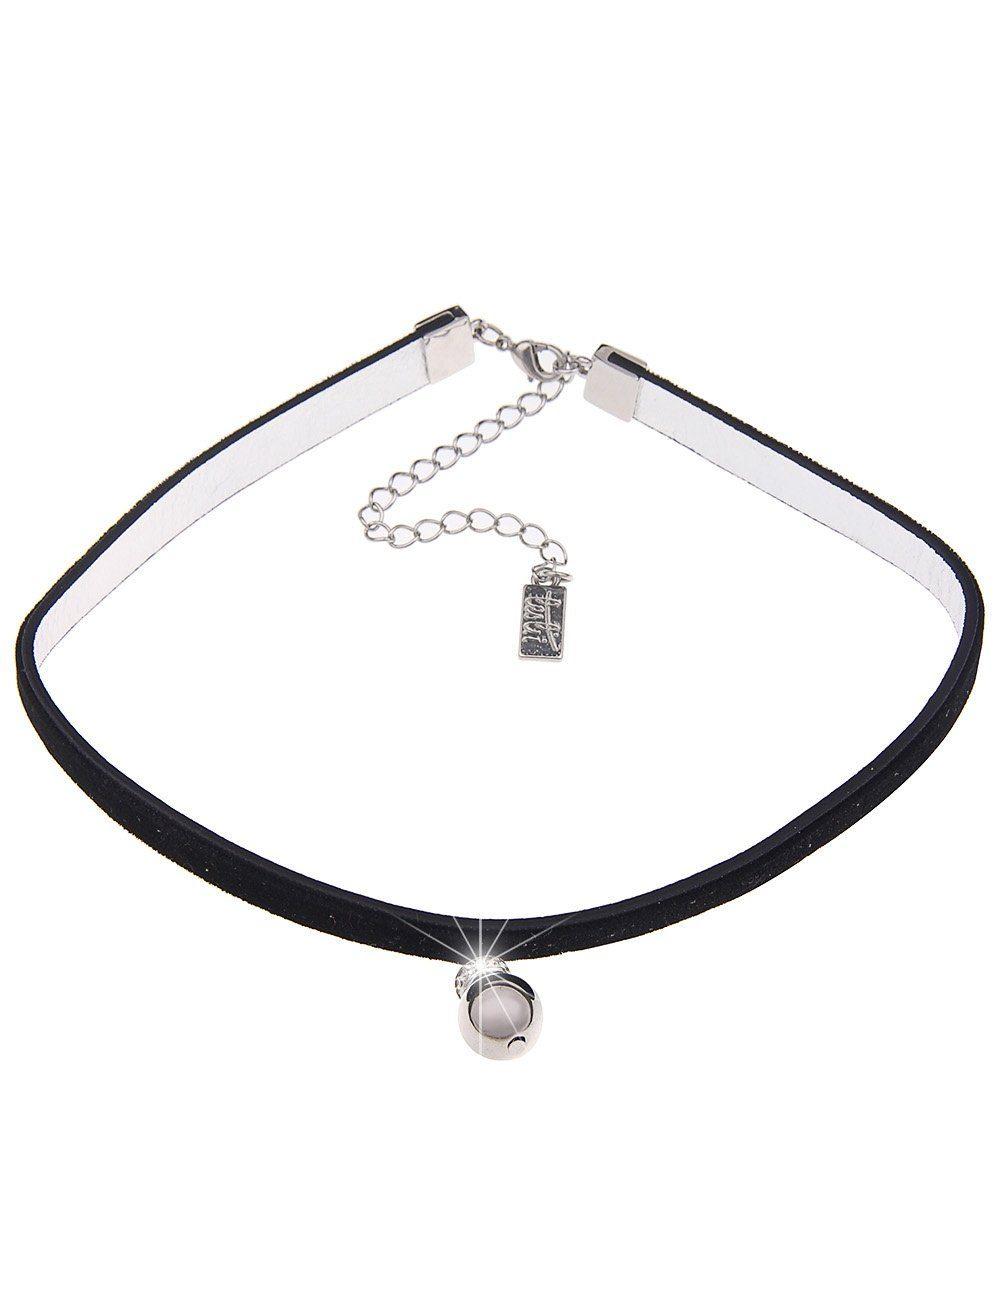 Leslii Halskette im angesagten Choker-Design